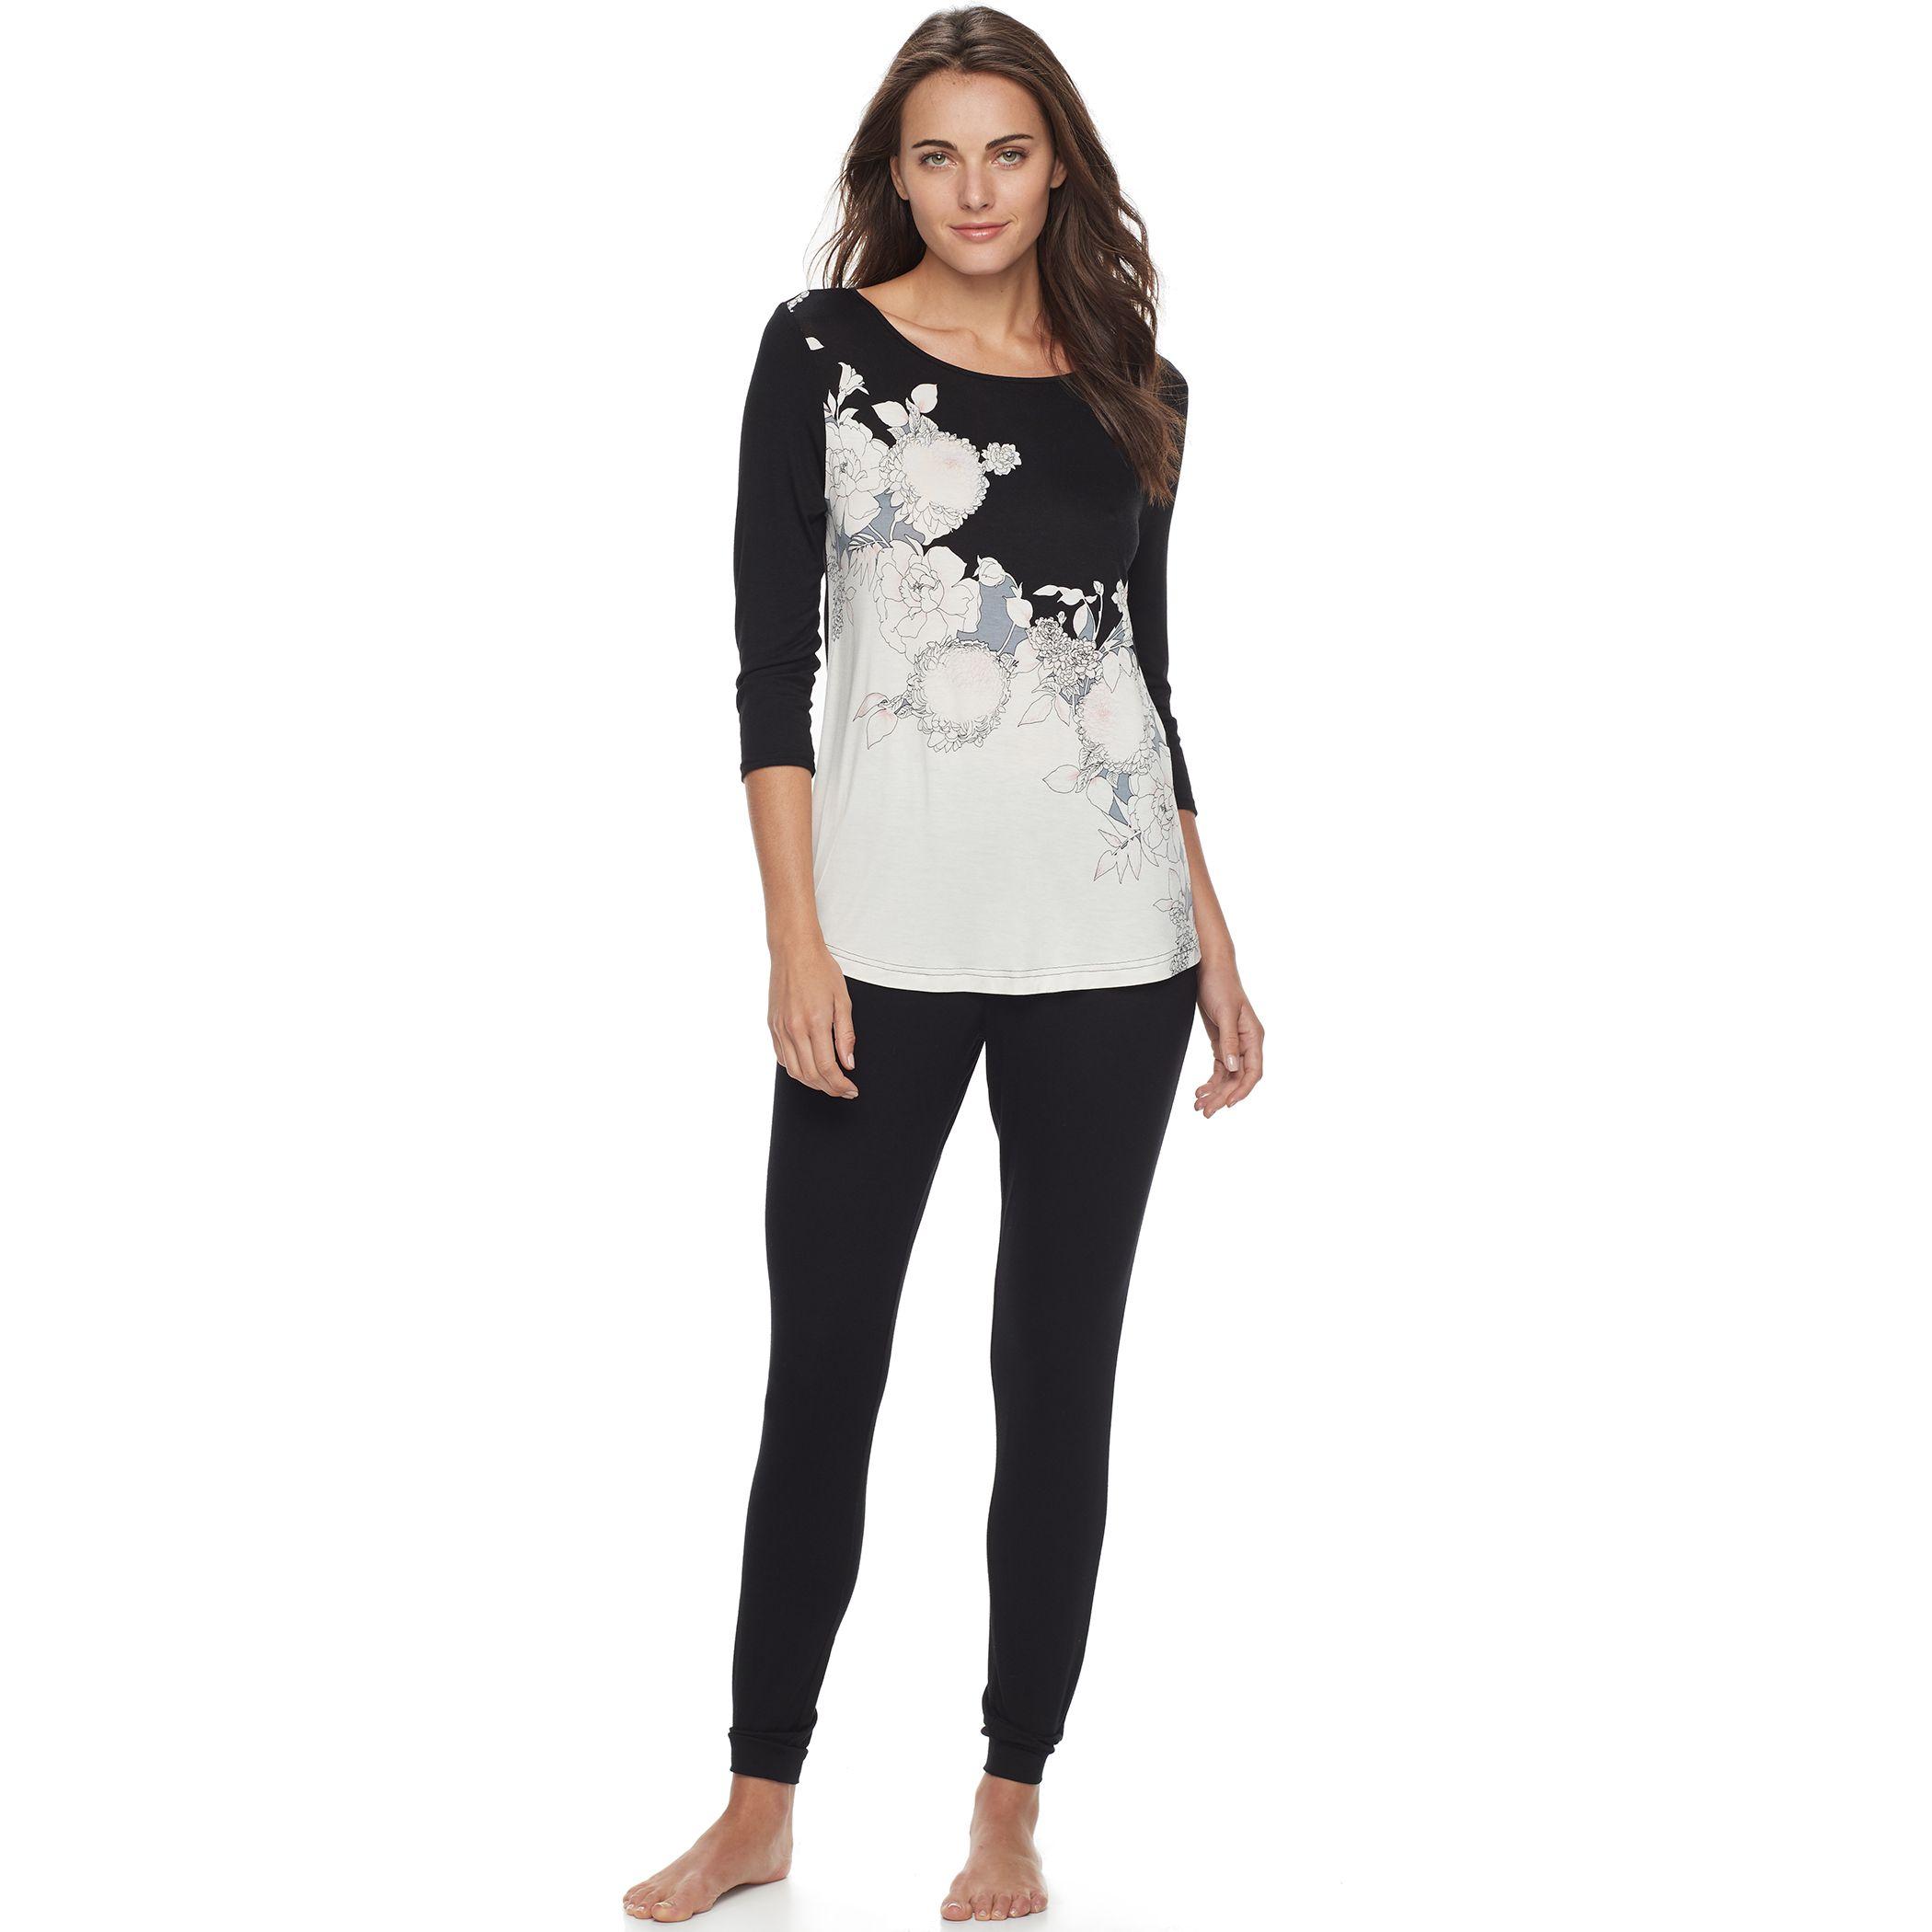 2944254_Black_And_White?wid=240&hei=240&op_sharpen=1 apt 9 sleepwear, clothing kohl's,Kohls Apt 9 Womens Clothing